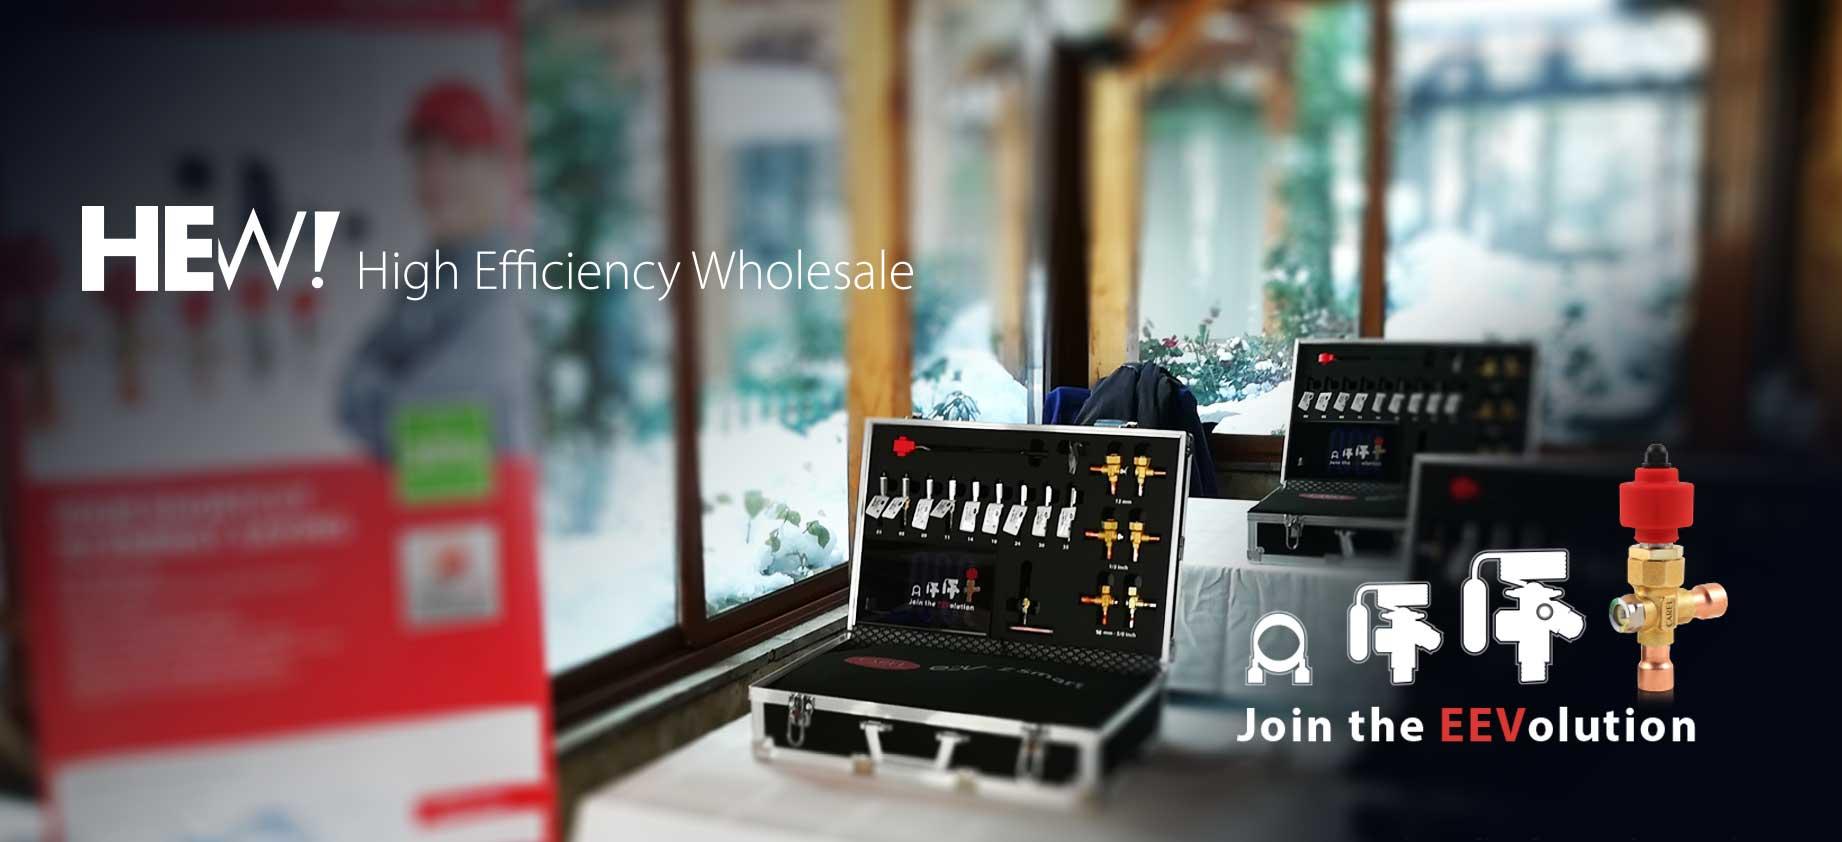 CAREL | Connected Efficiency